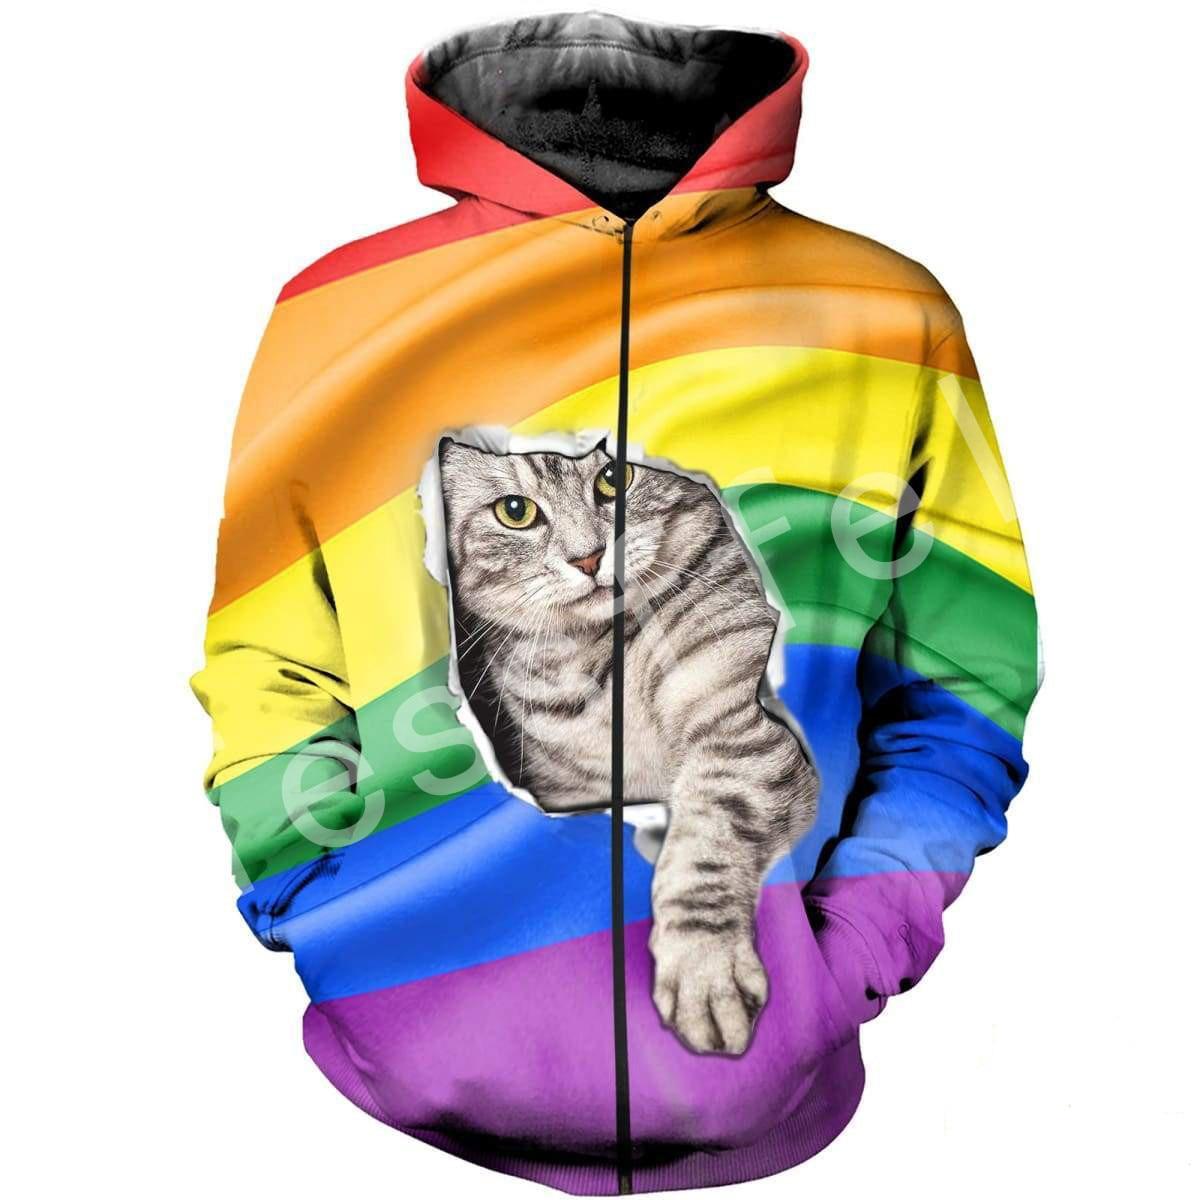 Tessffel Animal Cat Harajuku MenWomen HipHop 3D full Printed Sweatshirts Hoodie shirts Jacket Casual fit colorful camo Style 8 in Hoodies amp Sweatshirts from Men 39 s Clothing